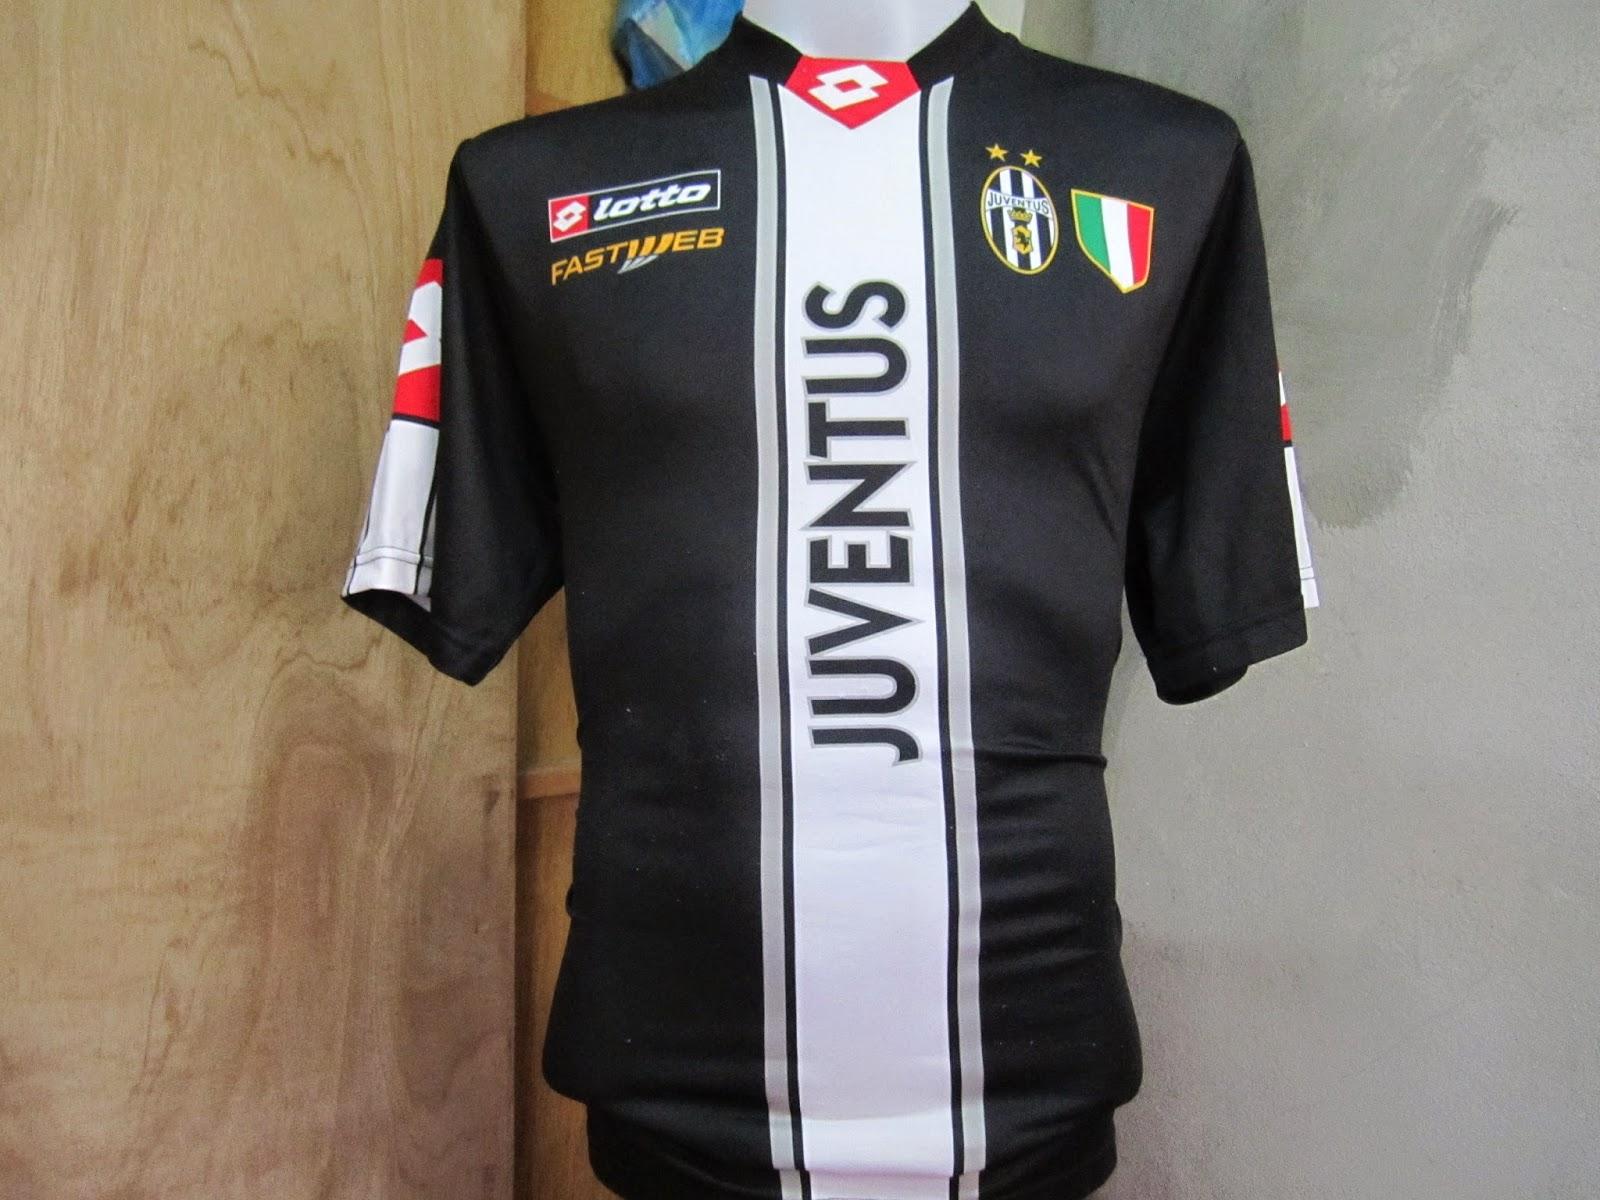 03d7e8991 BundleWalla  Juventus Lotto Training Jersey 2001 SOLD